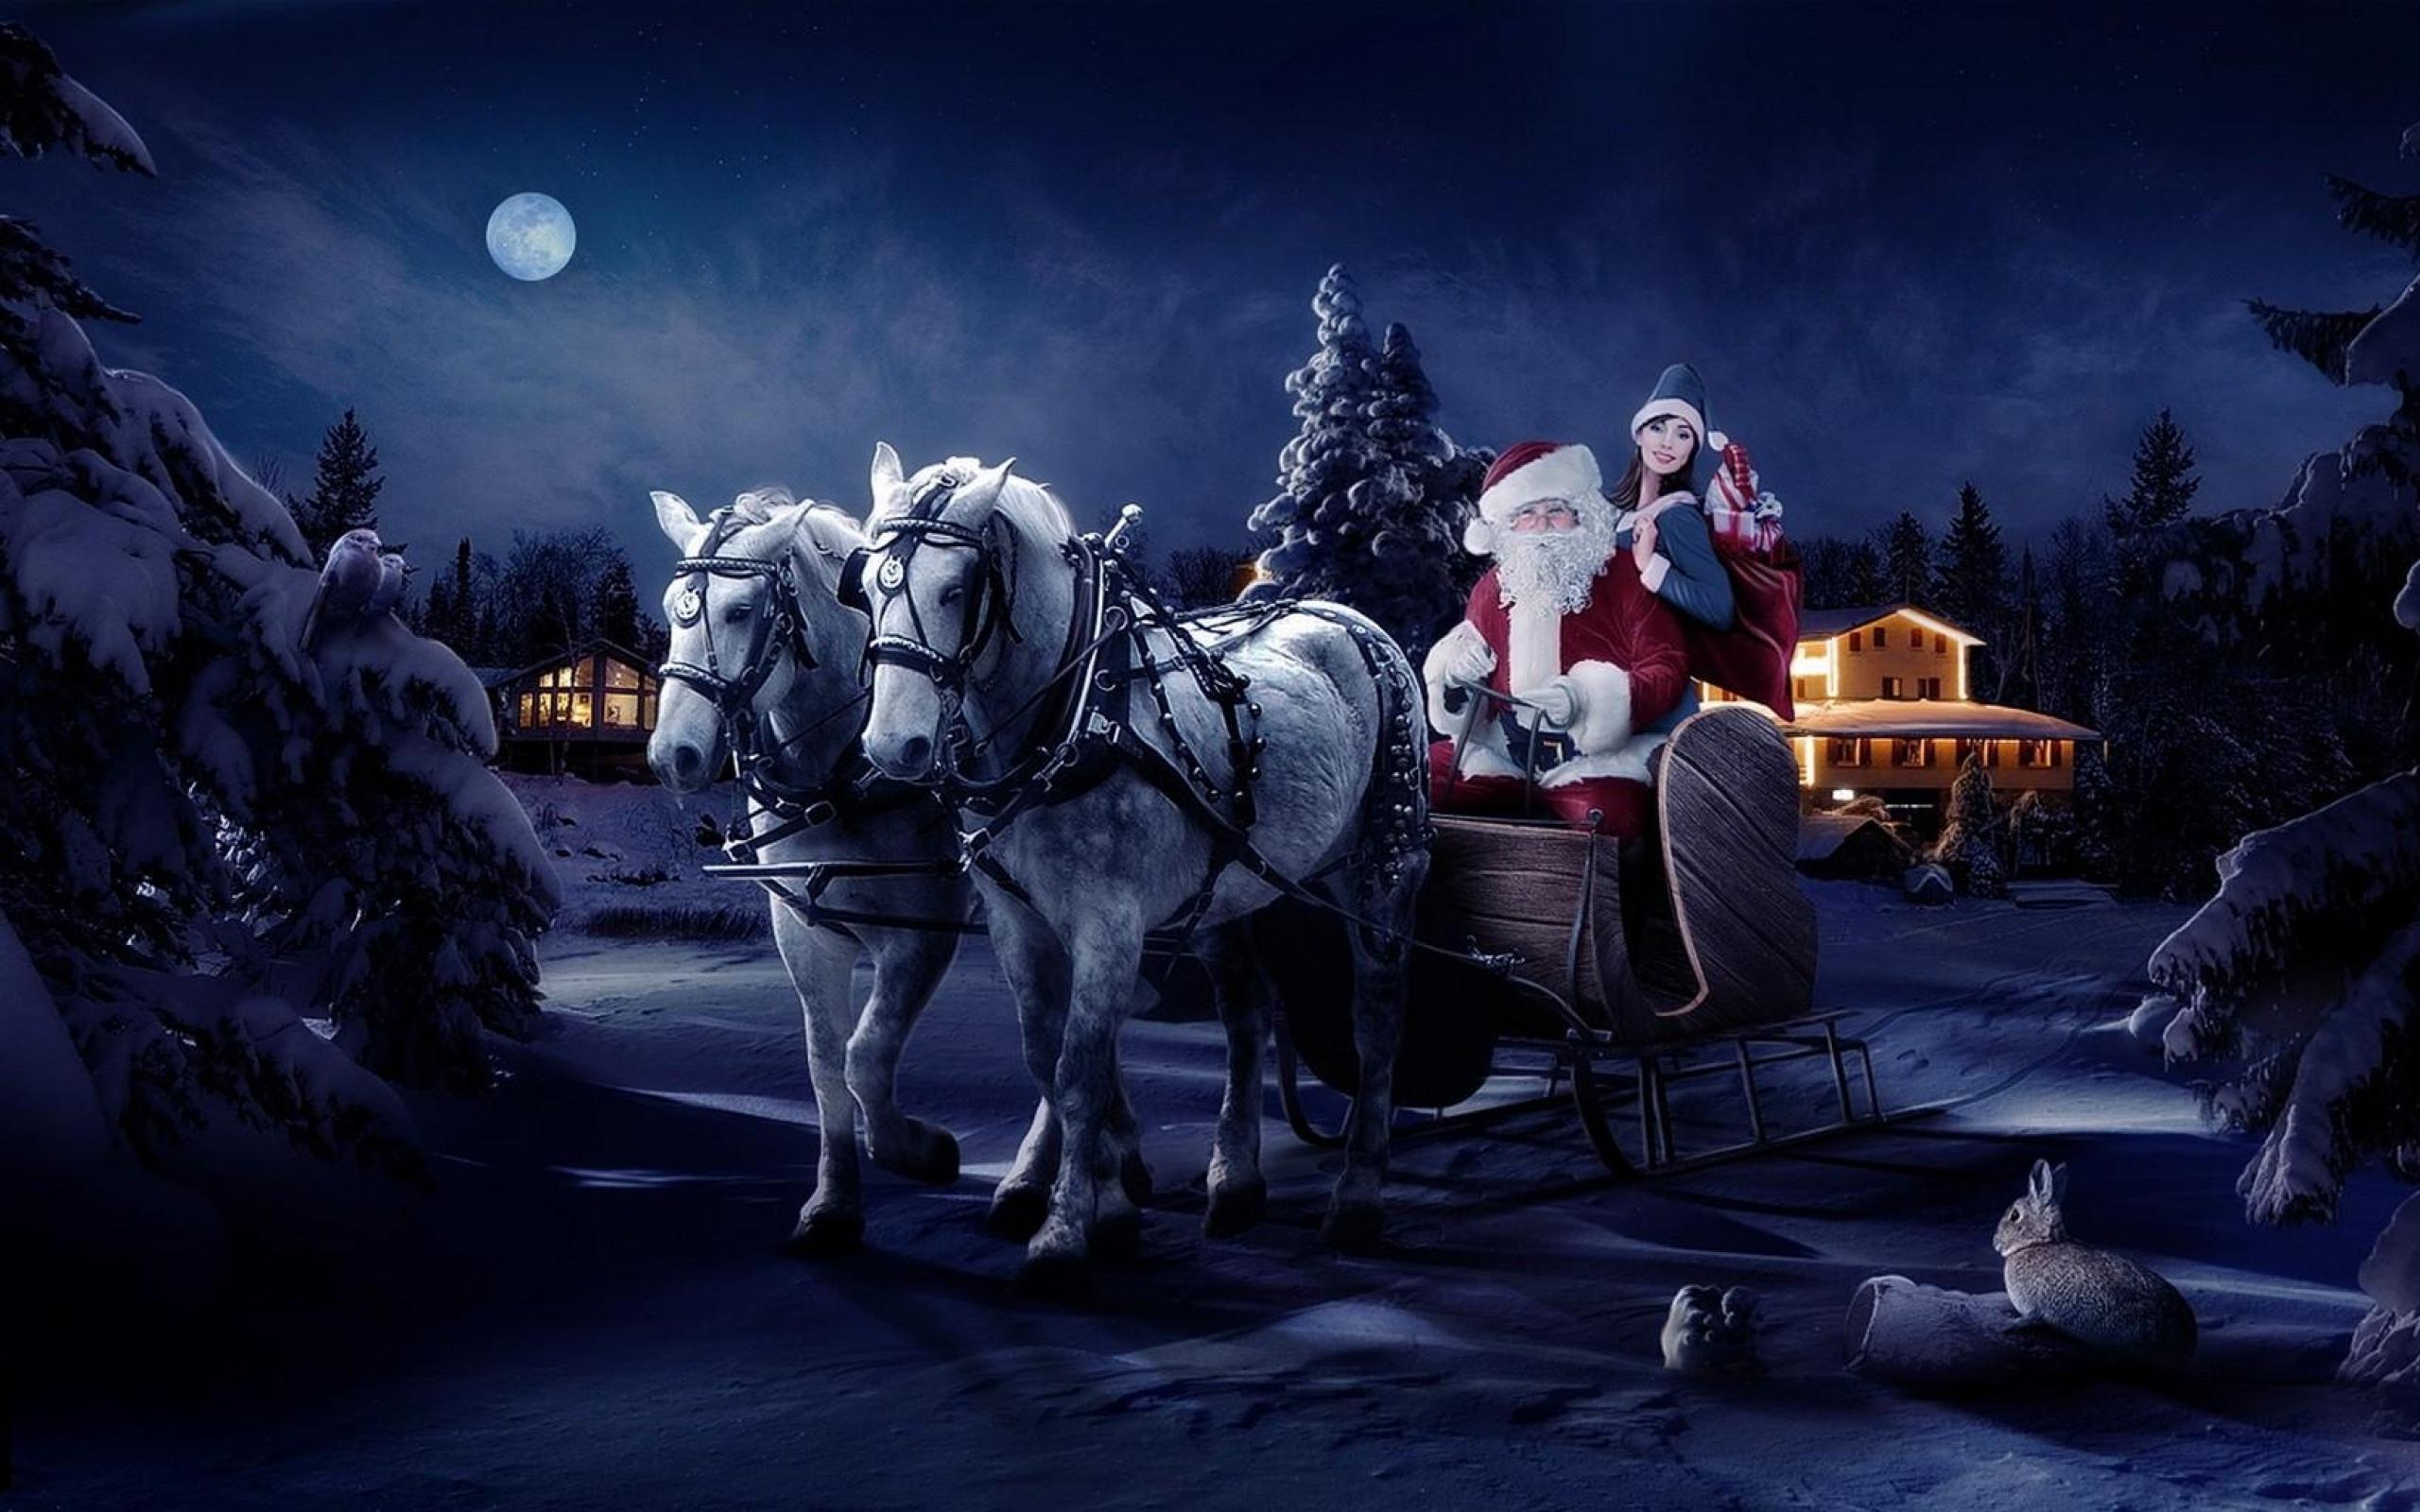 santa_claus_sleigh_girl_horse_tree_night_christmas_bag_gifts_41105_2560x1600